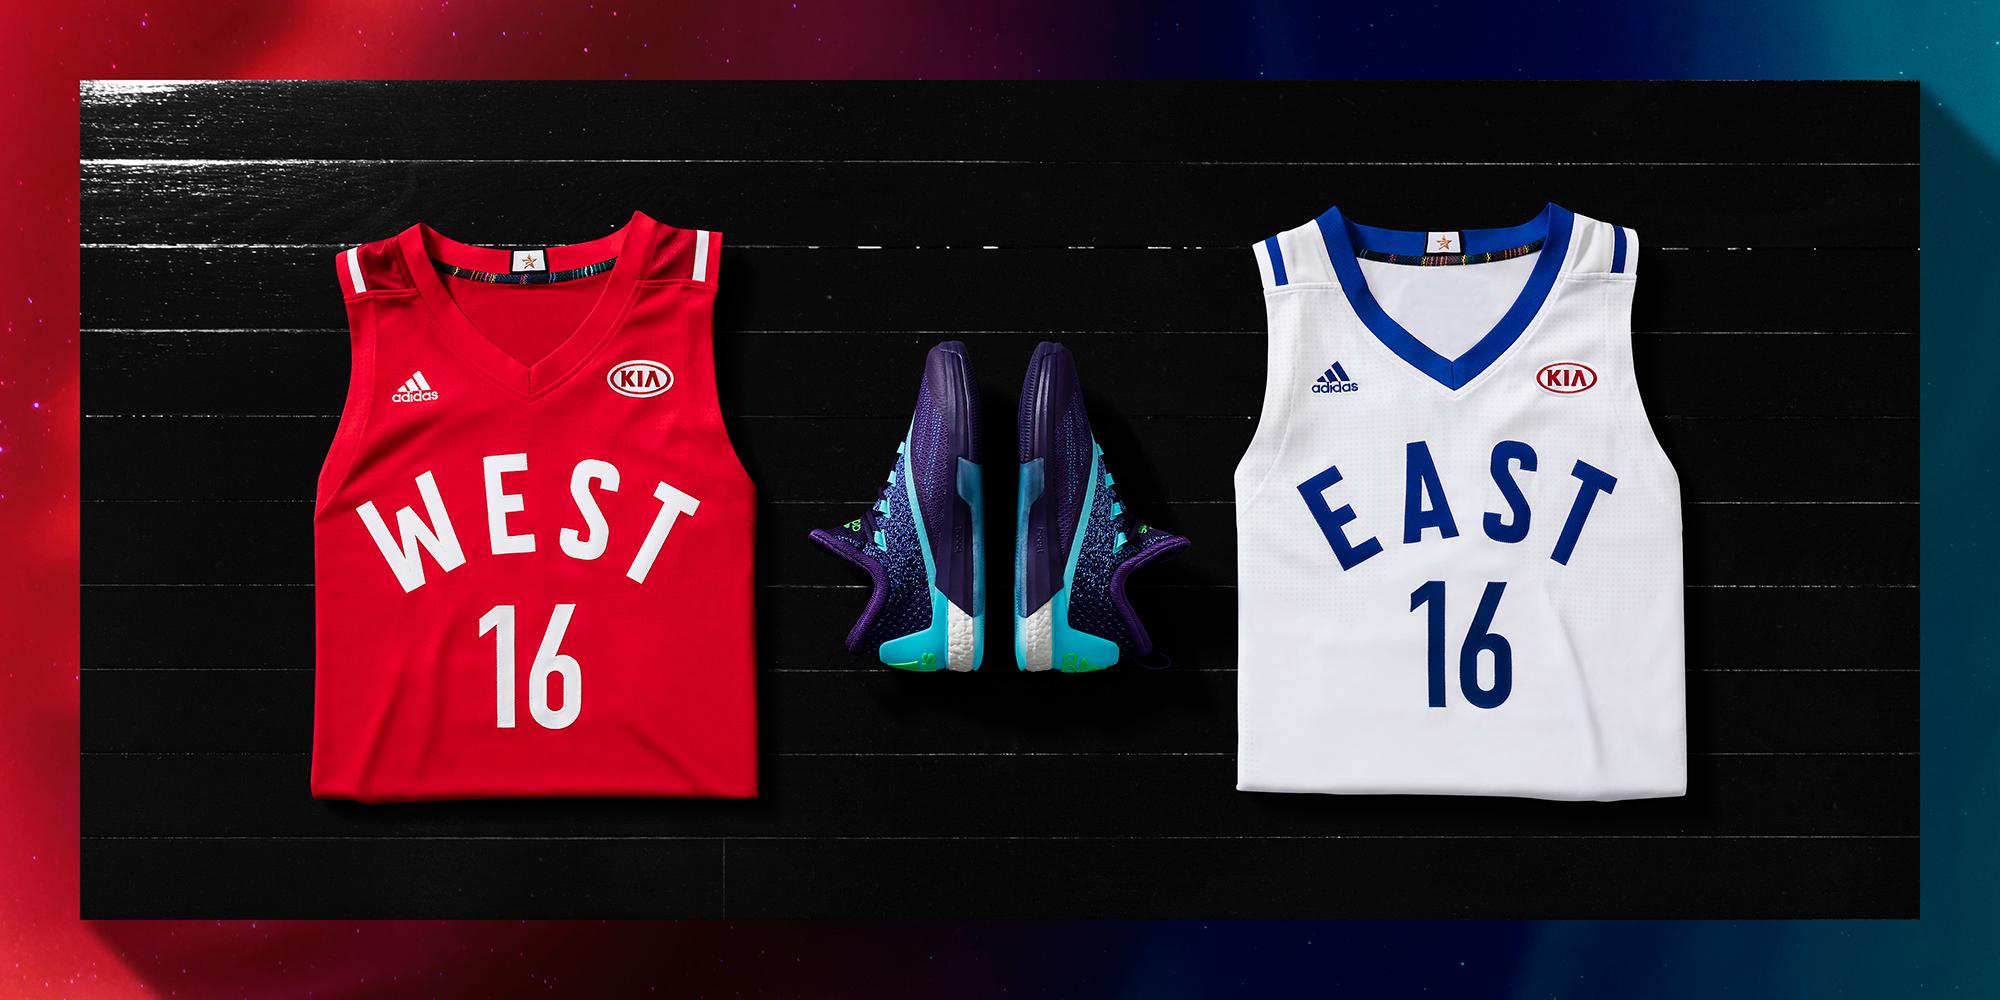 east jersey 2016